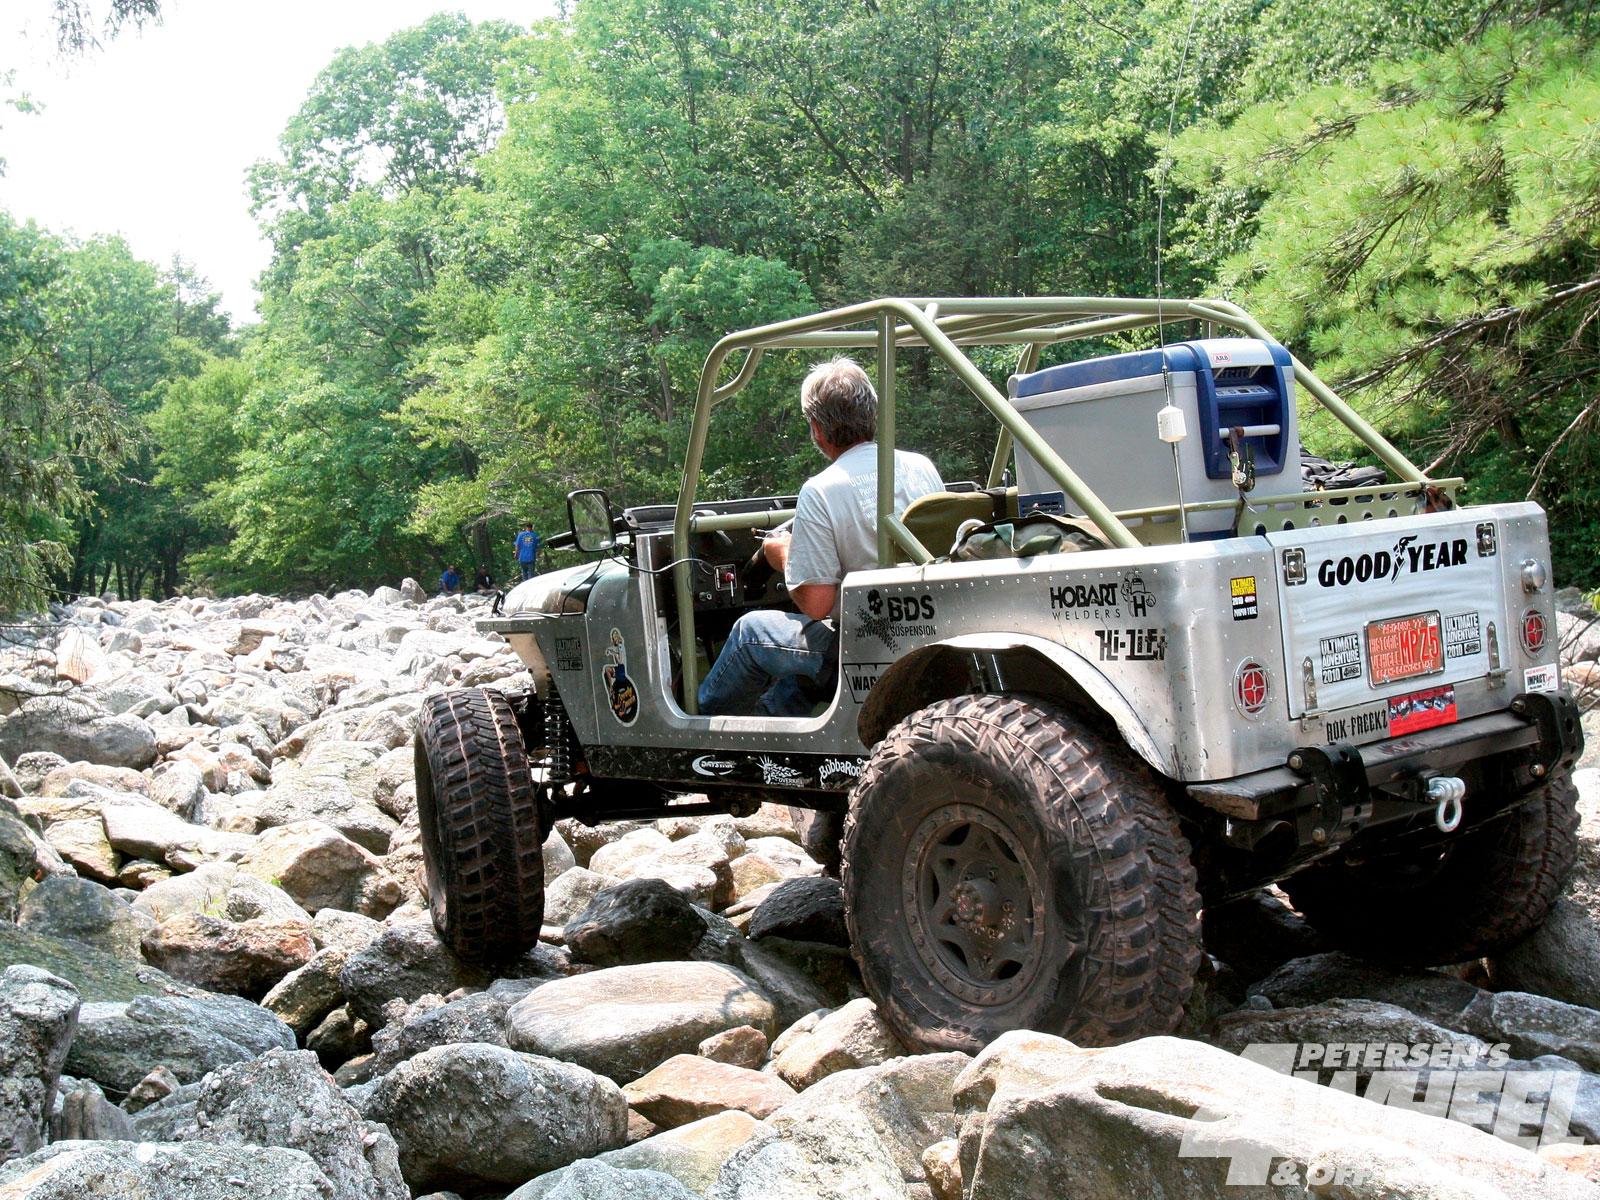 hight resolution of 131 1101 01 o 131 1101 ultimate adventure jeep cj 17 the uacj rear